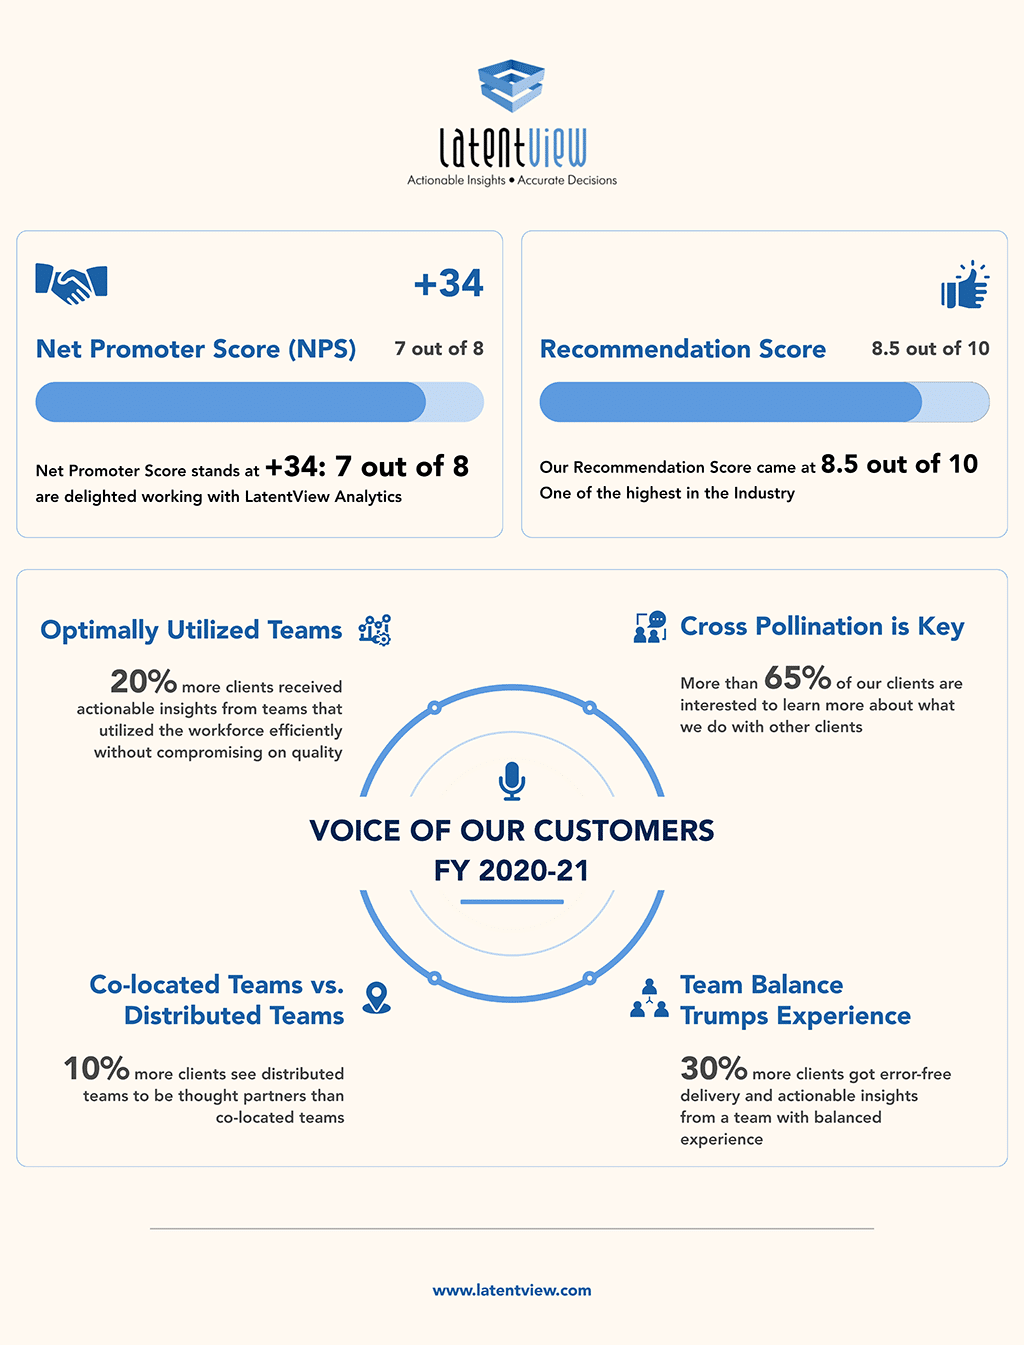 LatentView Analytics Voice of Customer Survey 2020-21